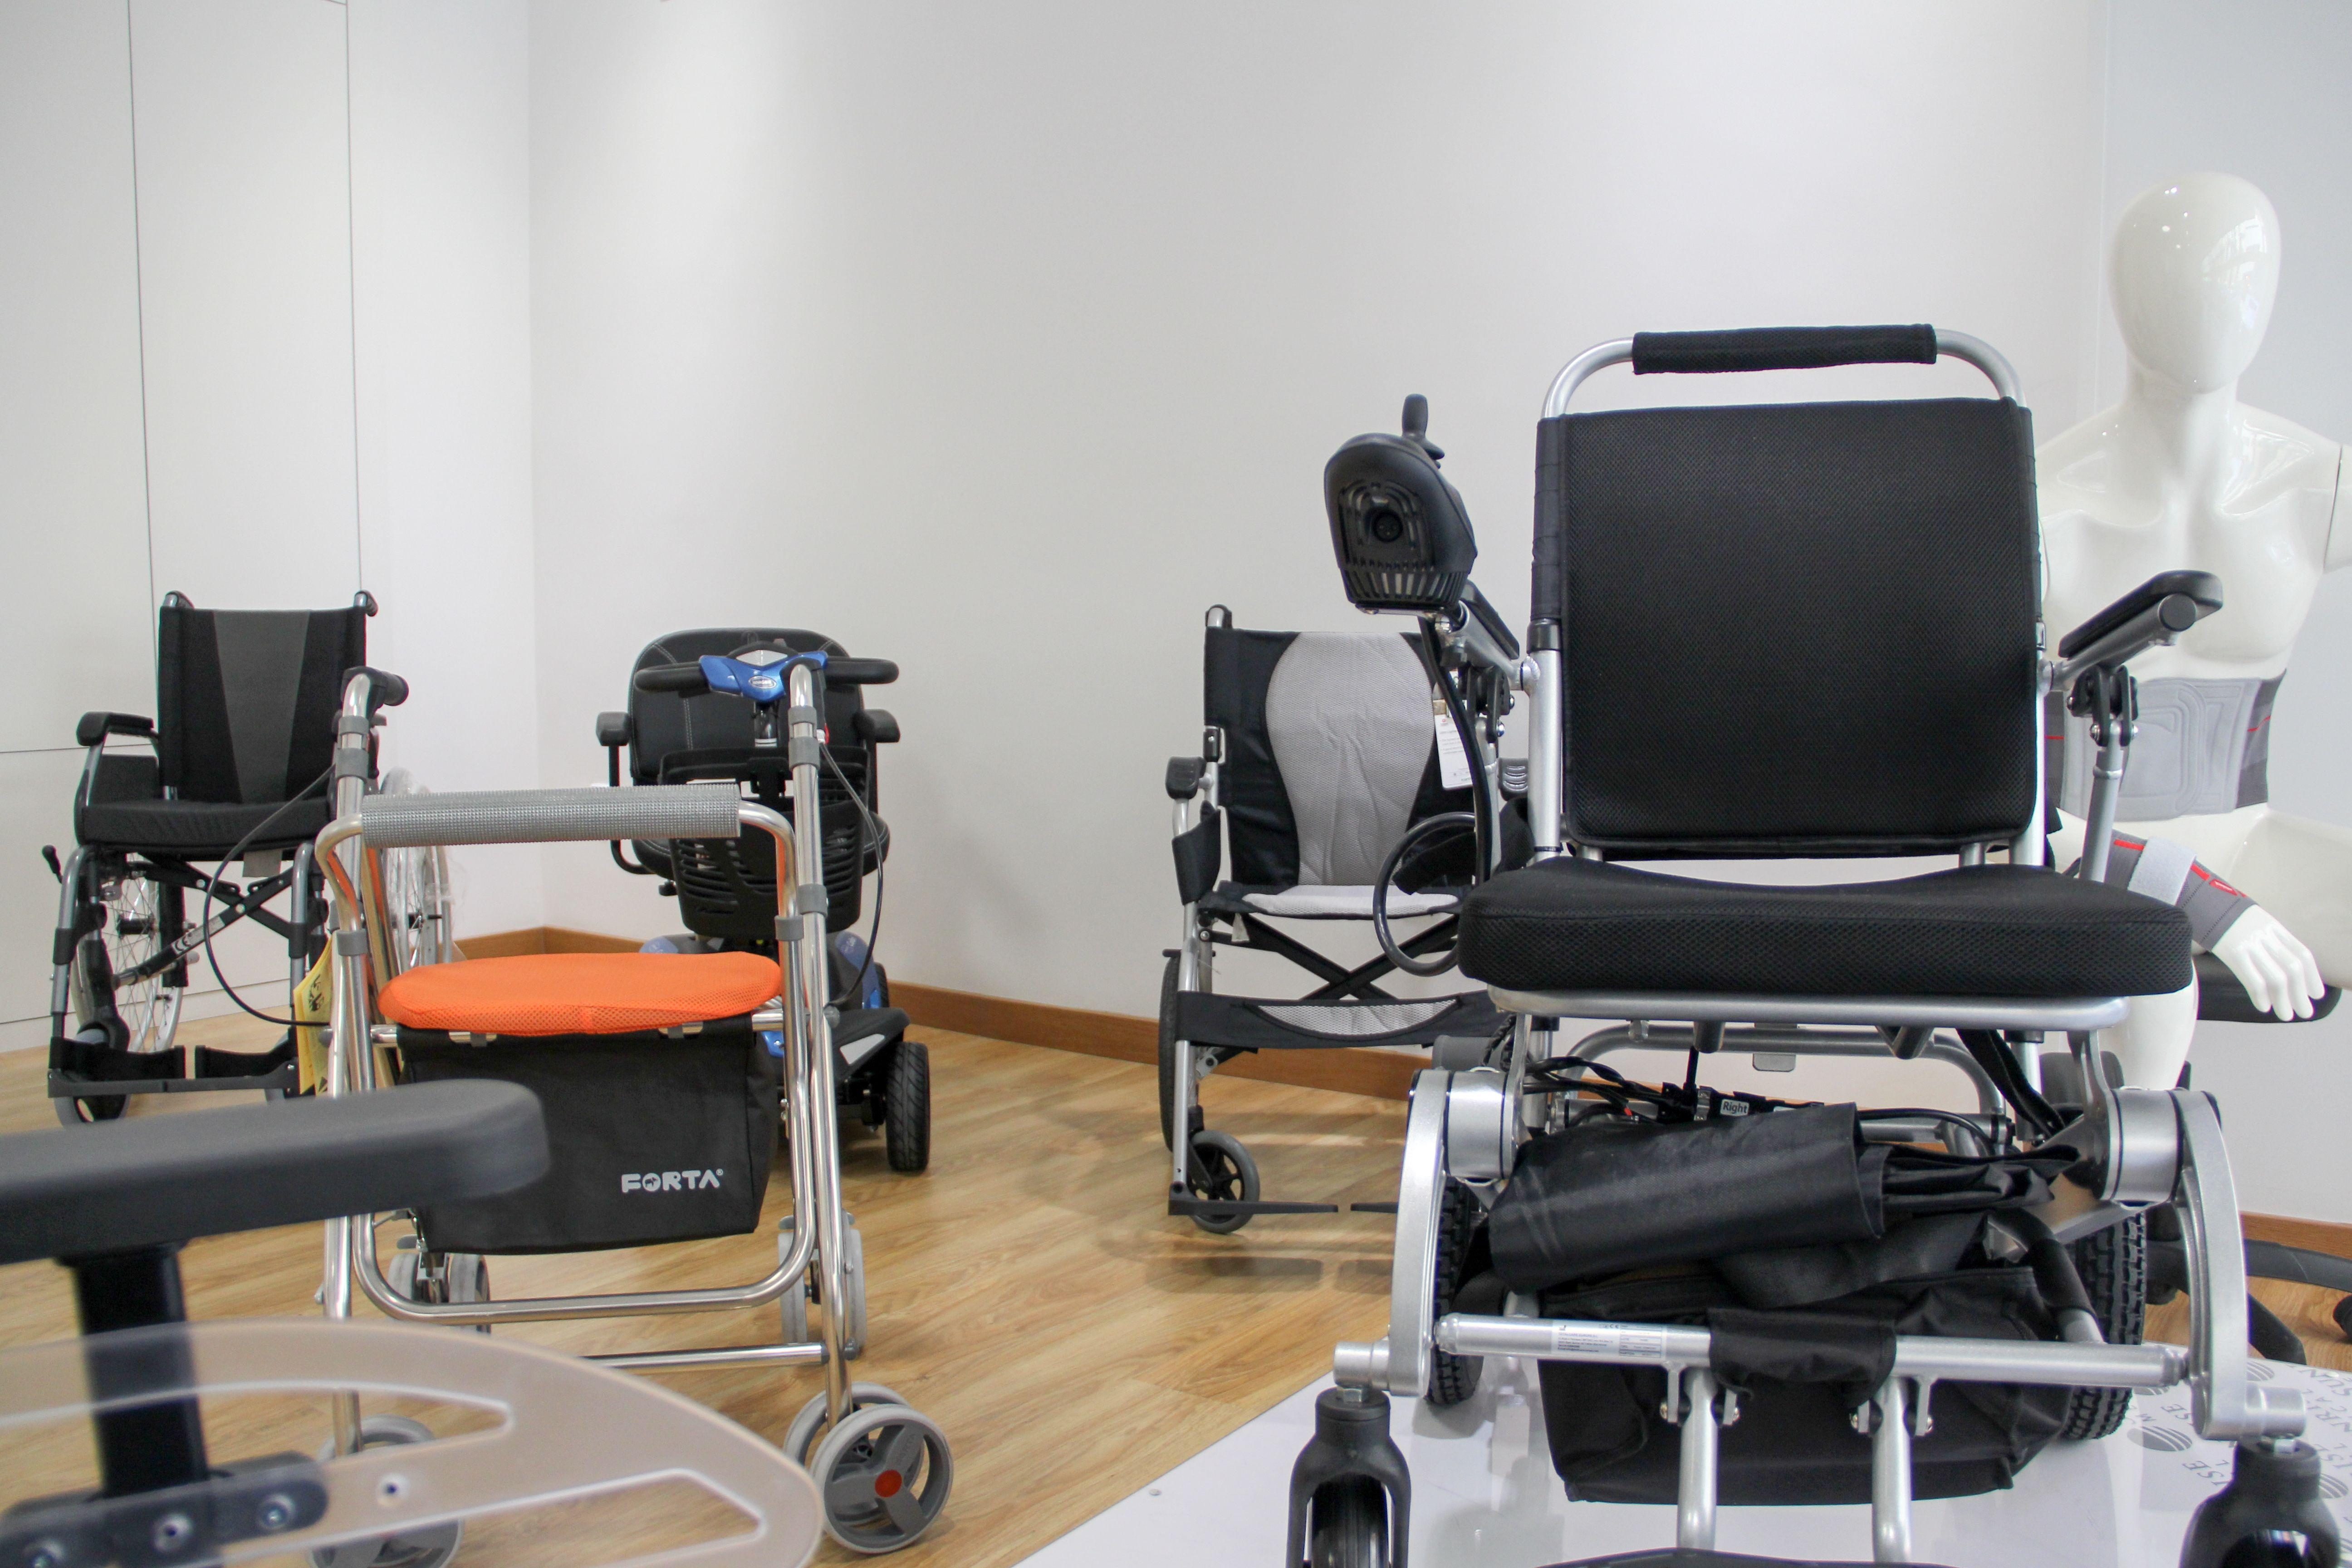 Foto 1 de Ortopedia en Madrid | Gabinete de Ortopedia Alcalá, S.L.